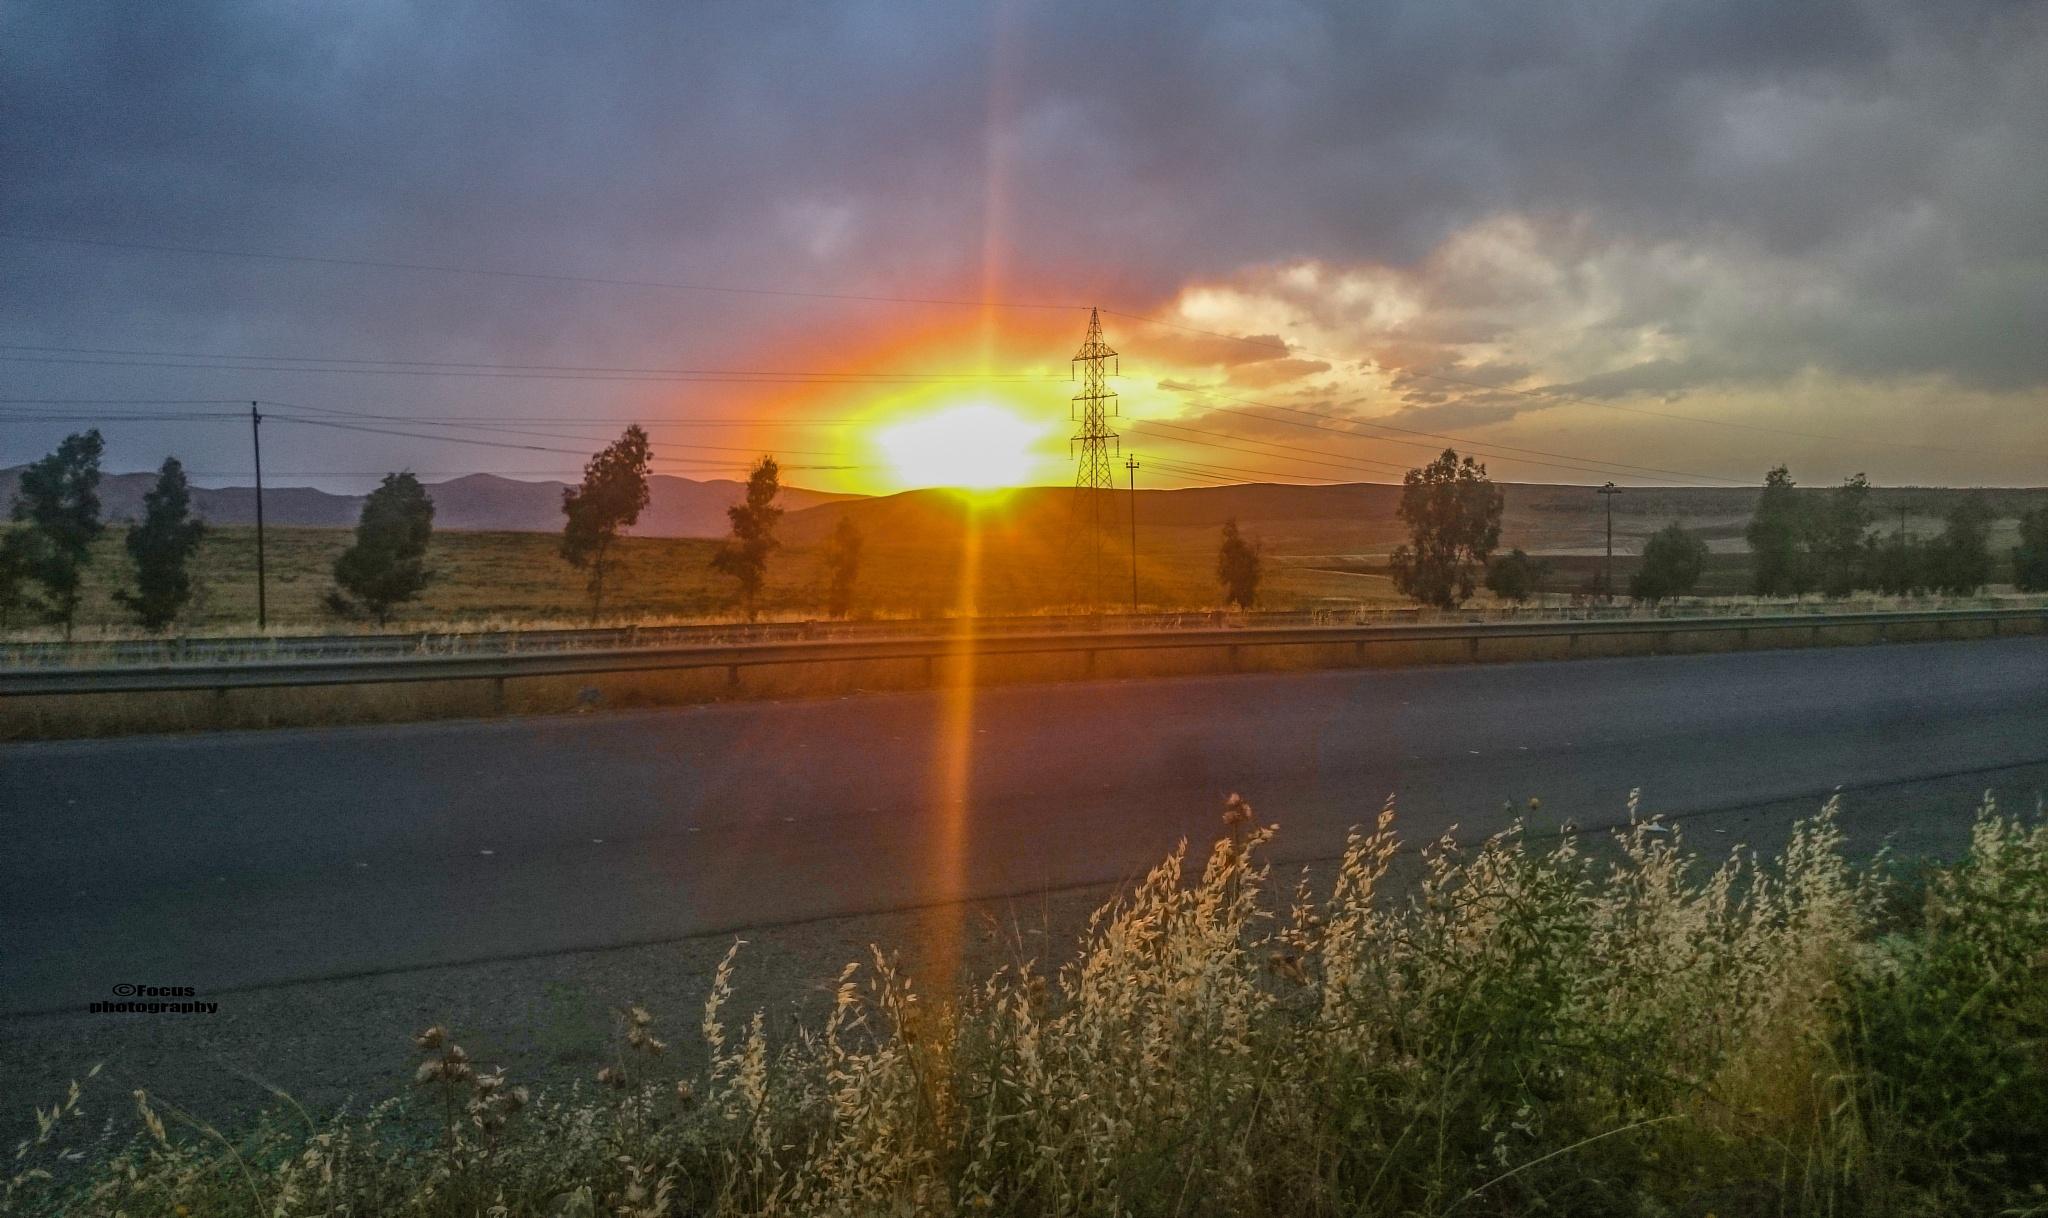 sun out of the soil by farman_focus